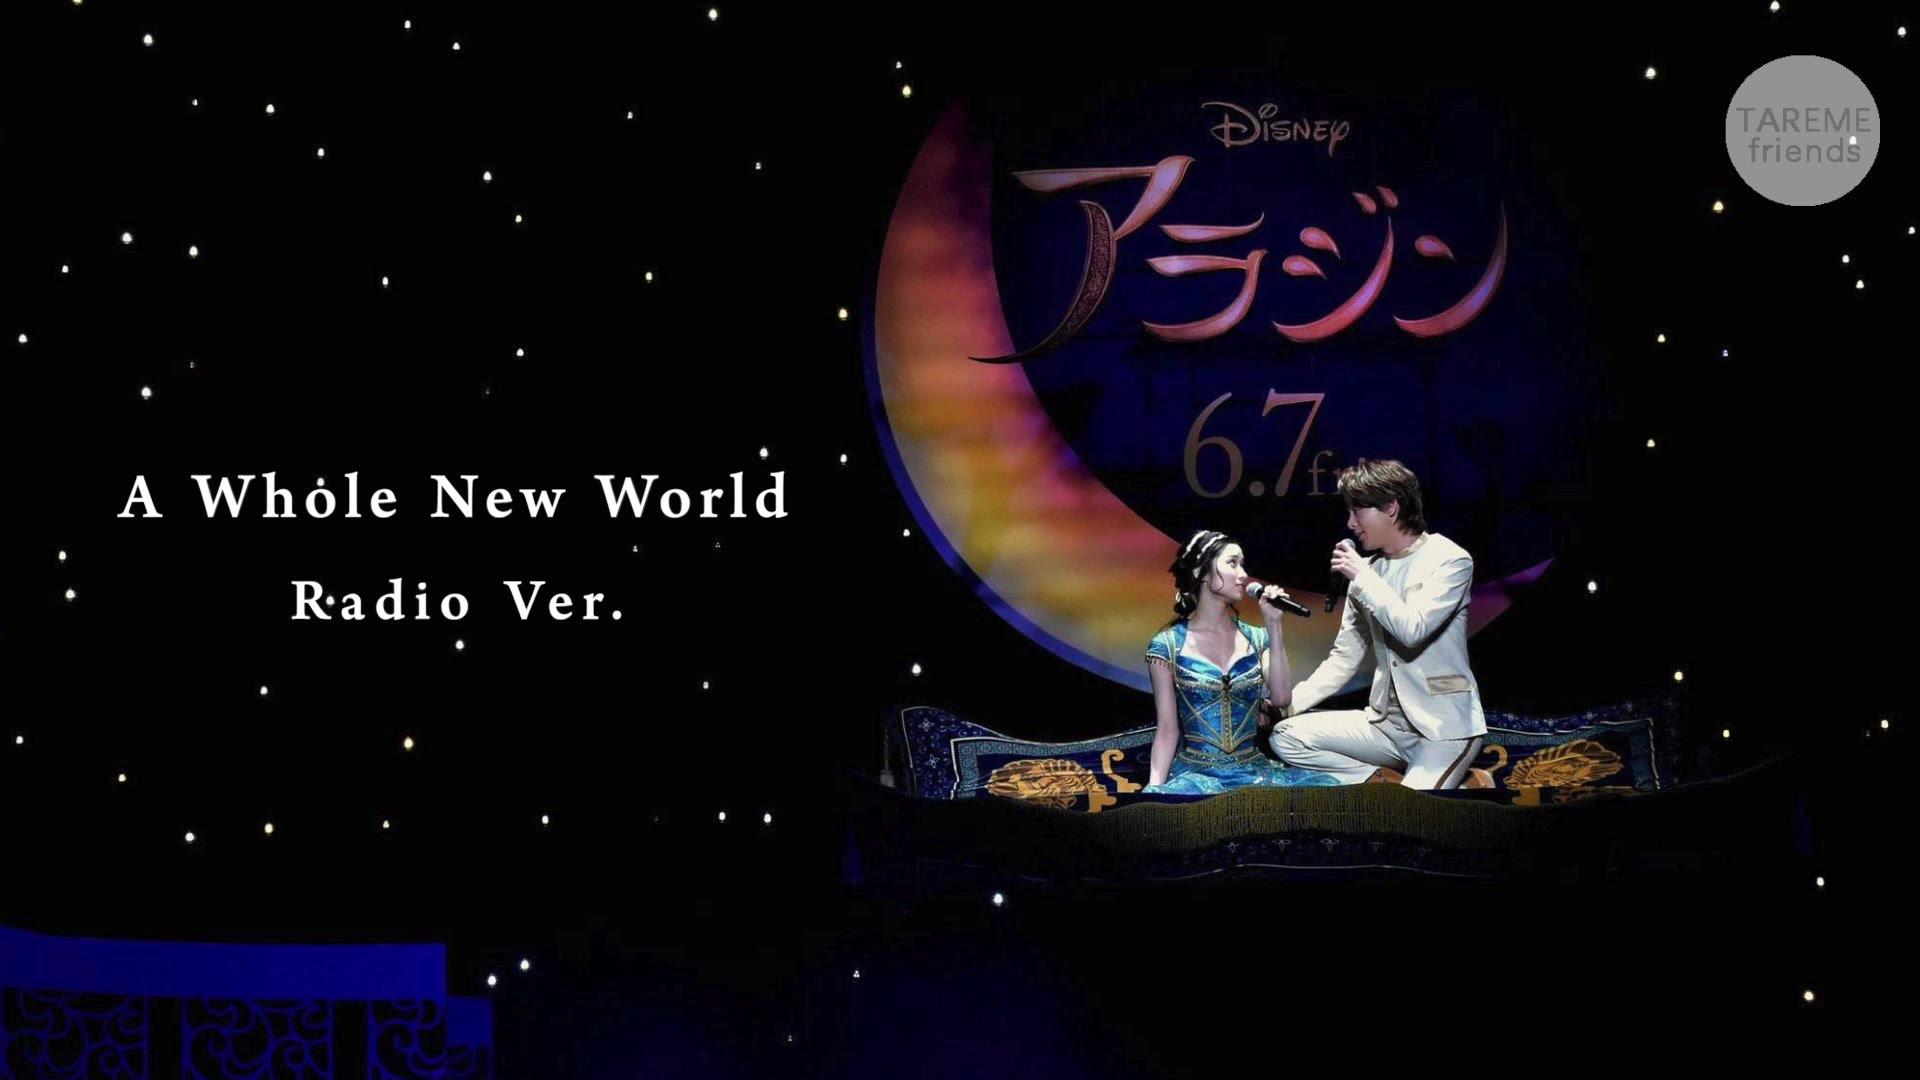 a whole new world 中文 版 歌詞